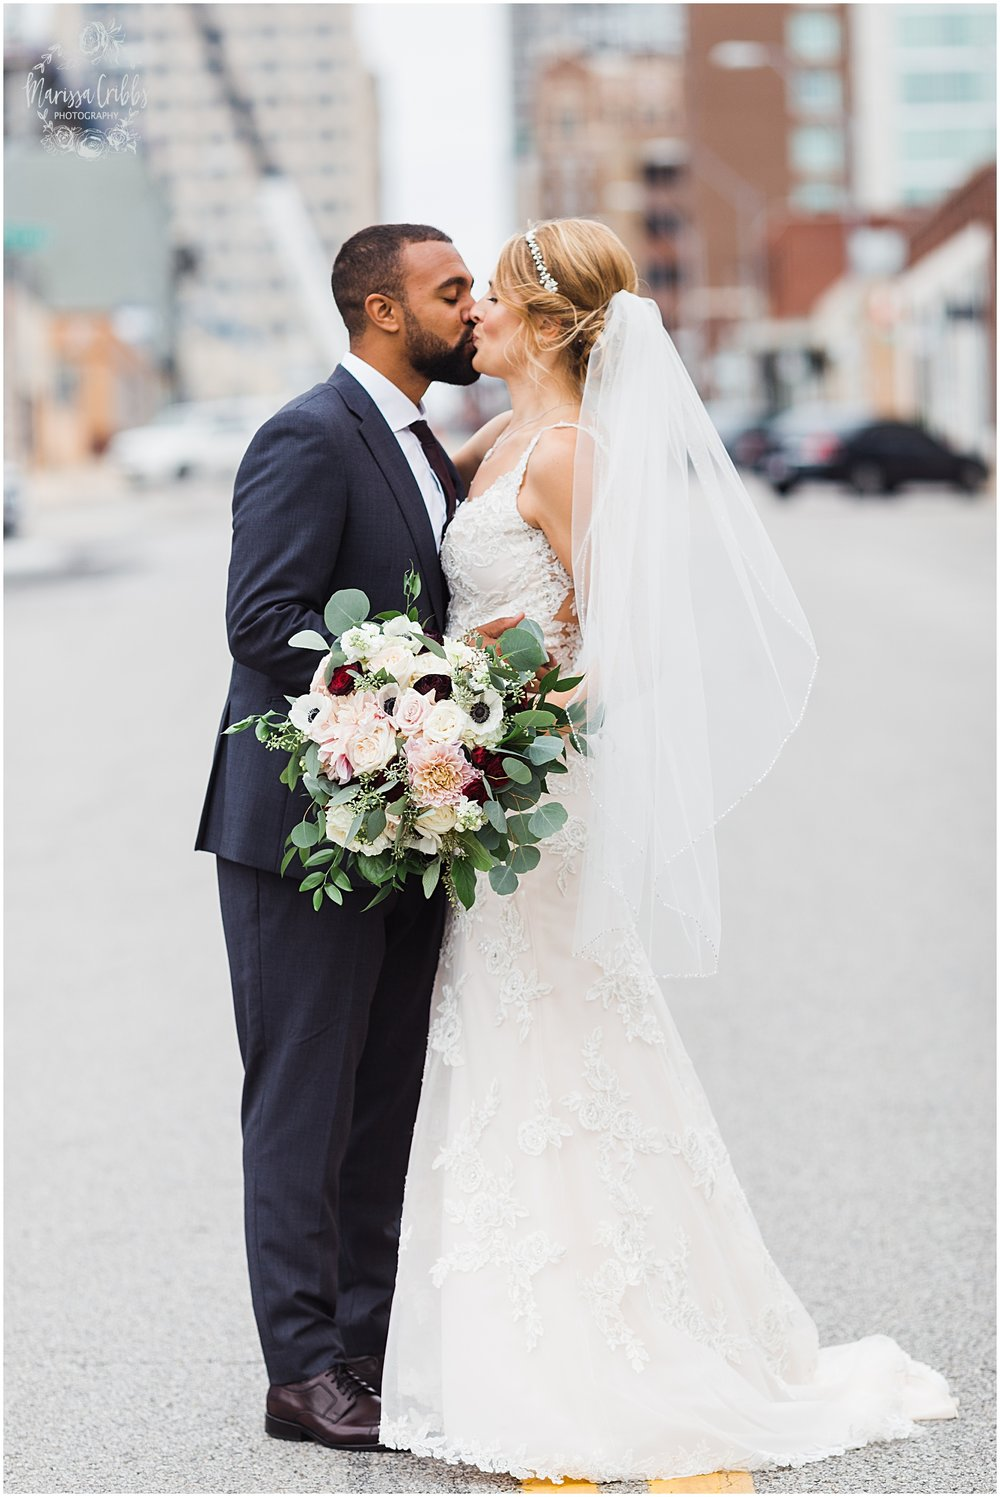 BAUER WEDDING | KELSEA & JUSTIN | MARISSA CRIBBS PHOTOGRAPHY_6541.jpg